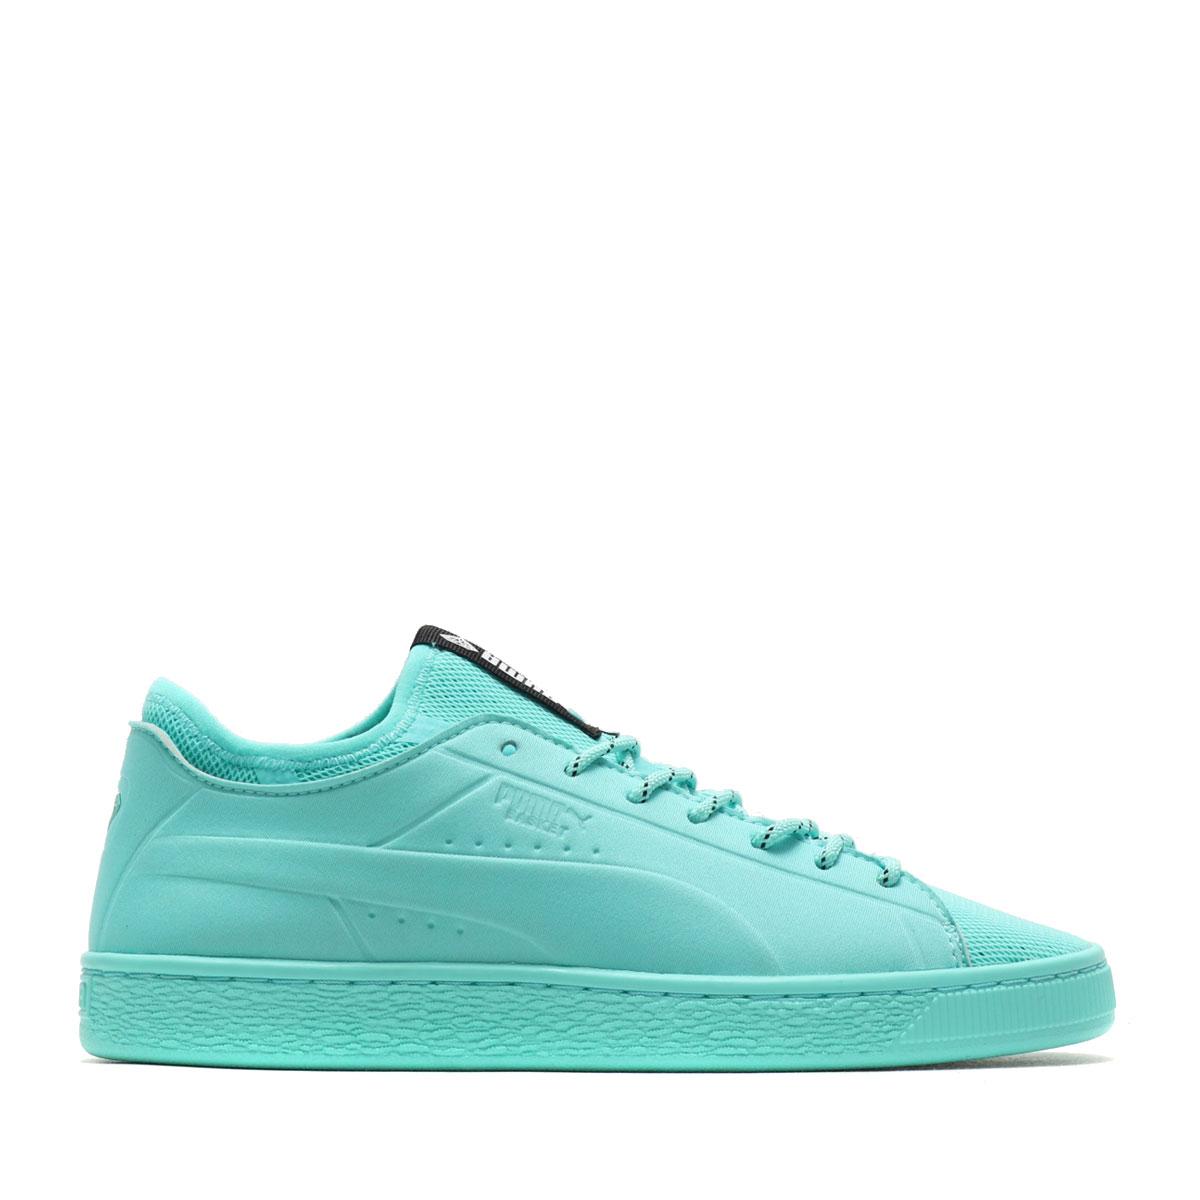 sports shoes e0146 613b1 PUMA BASKET SOCK LO DIAMOND (プーマバスケットソック LO diamond) (DIAMOND BLUE)